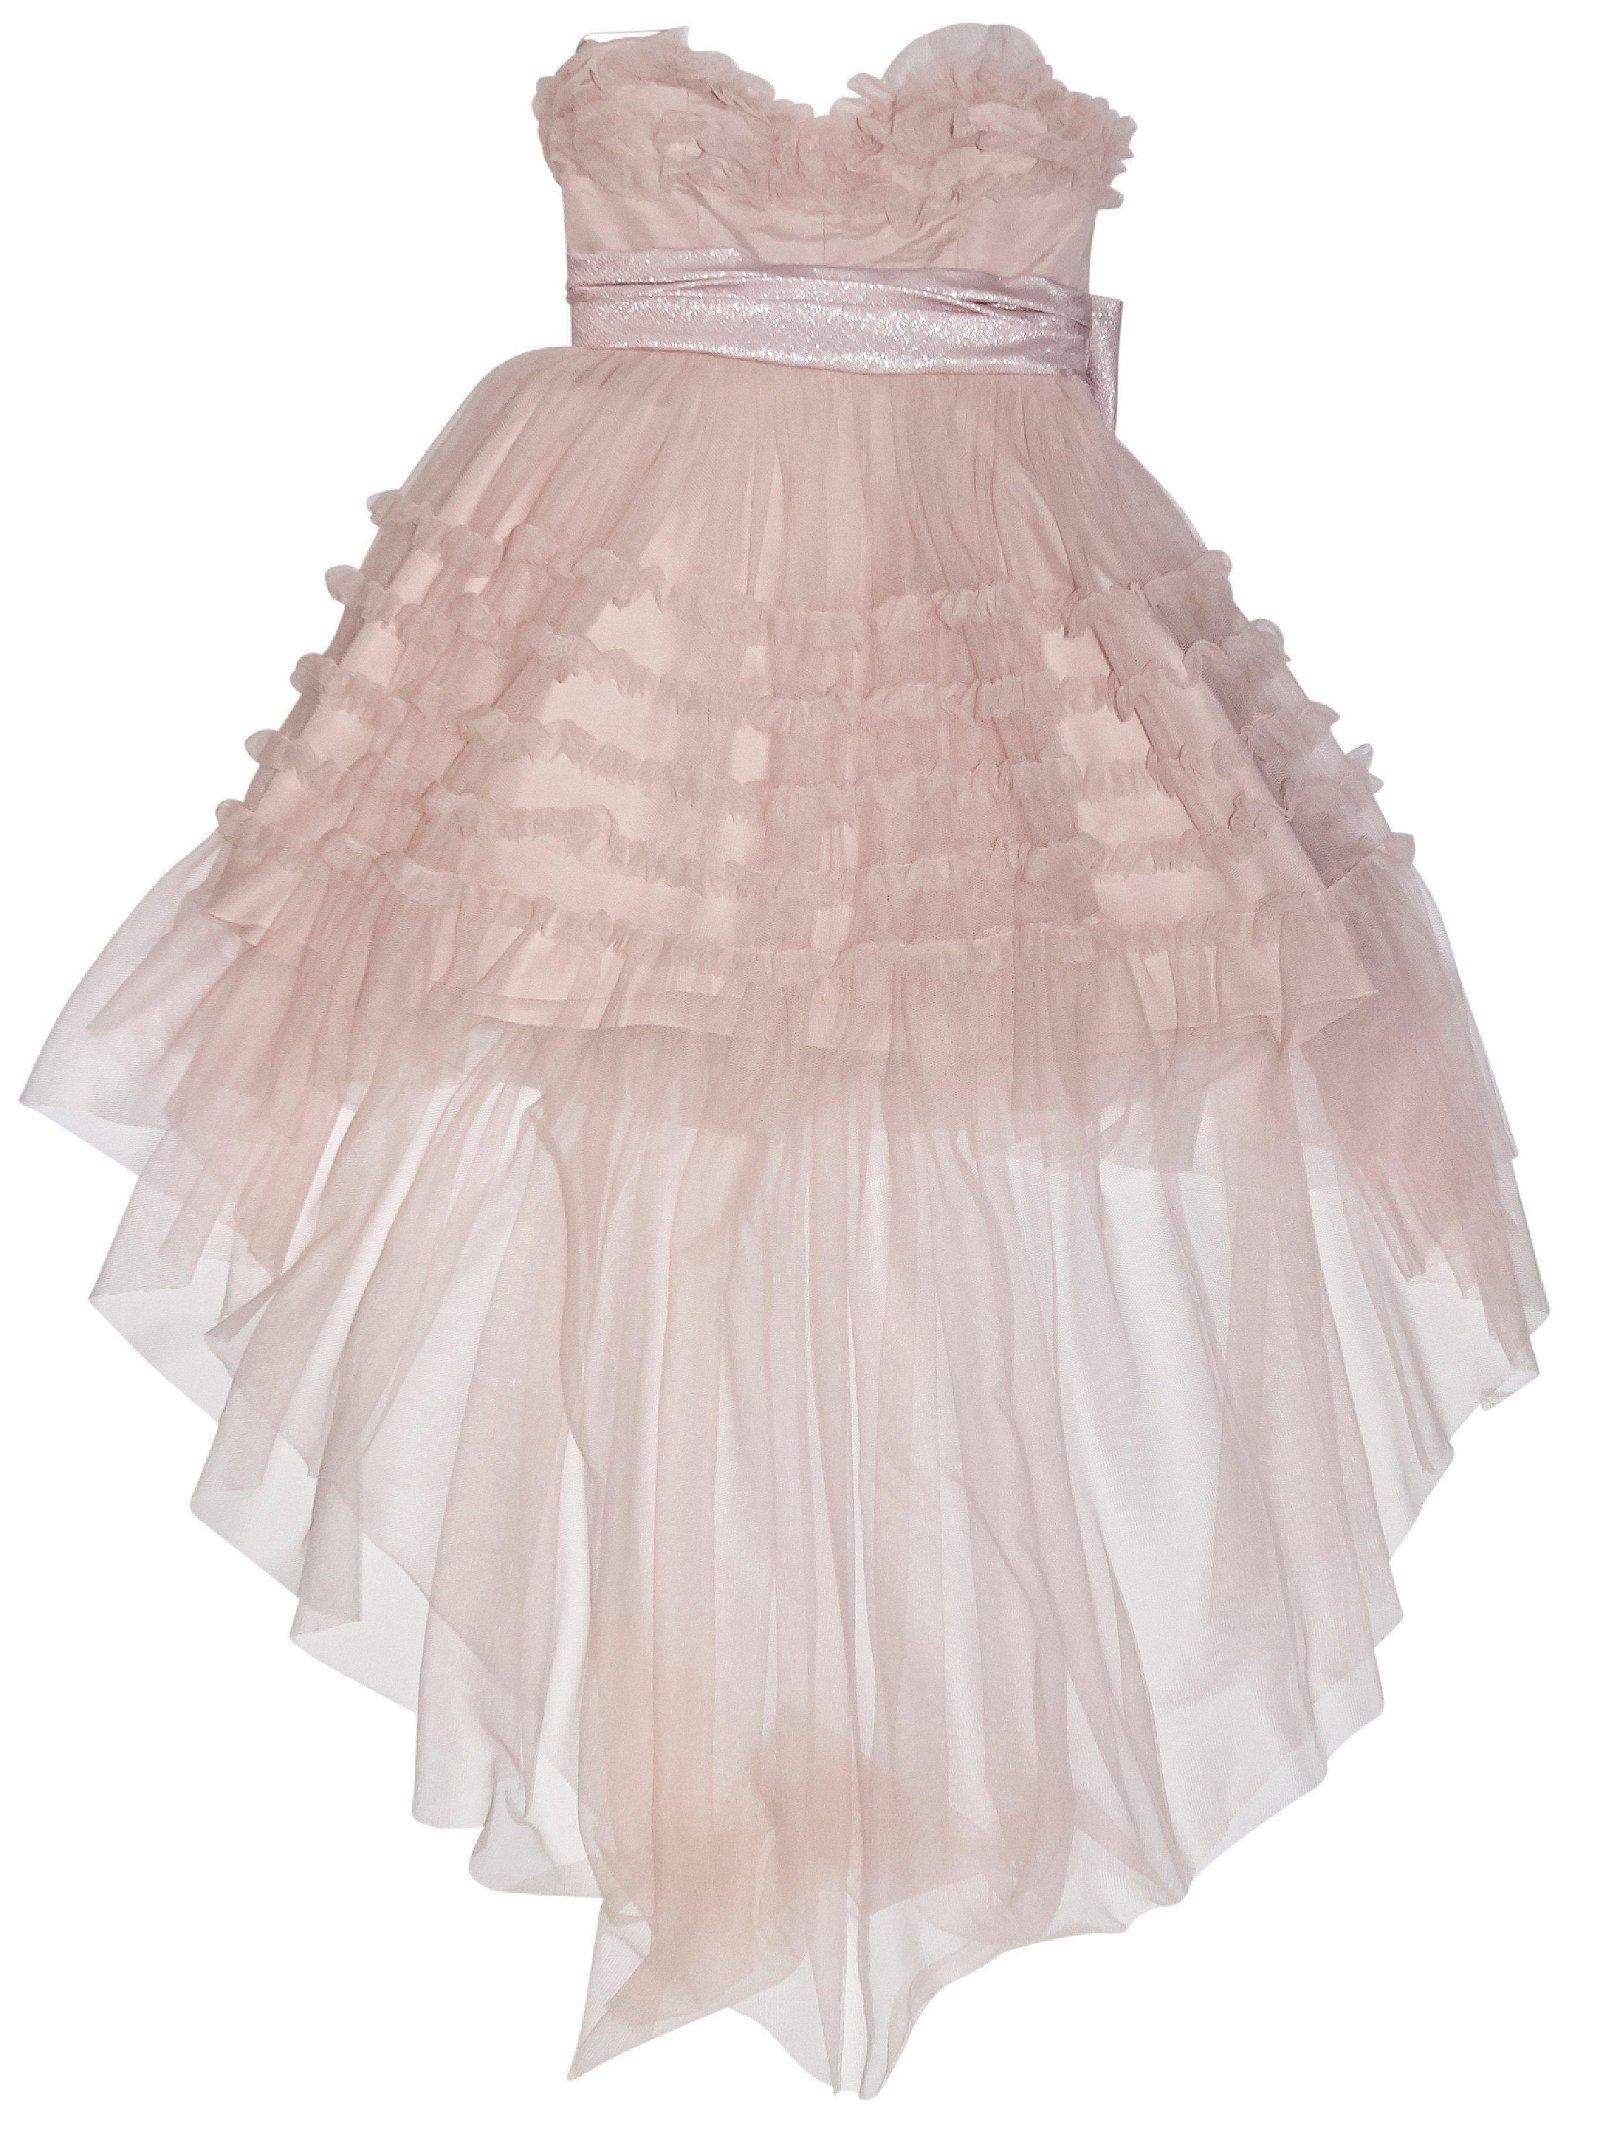 Pink Saint Laurent Ruffled Tulle Strapless 2015 Runway